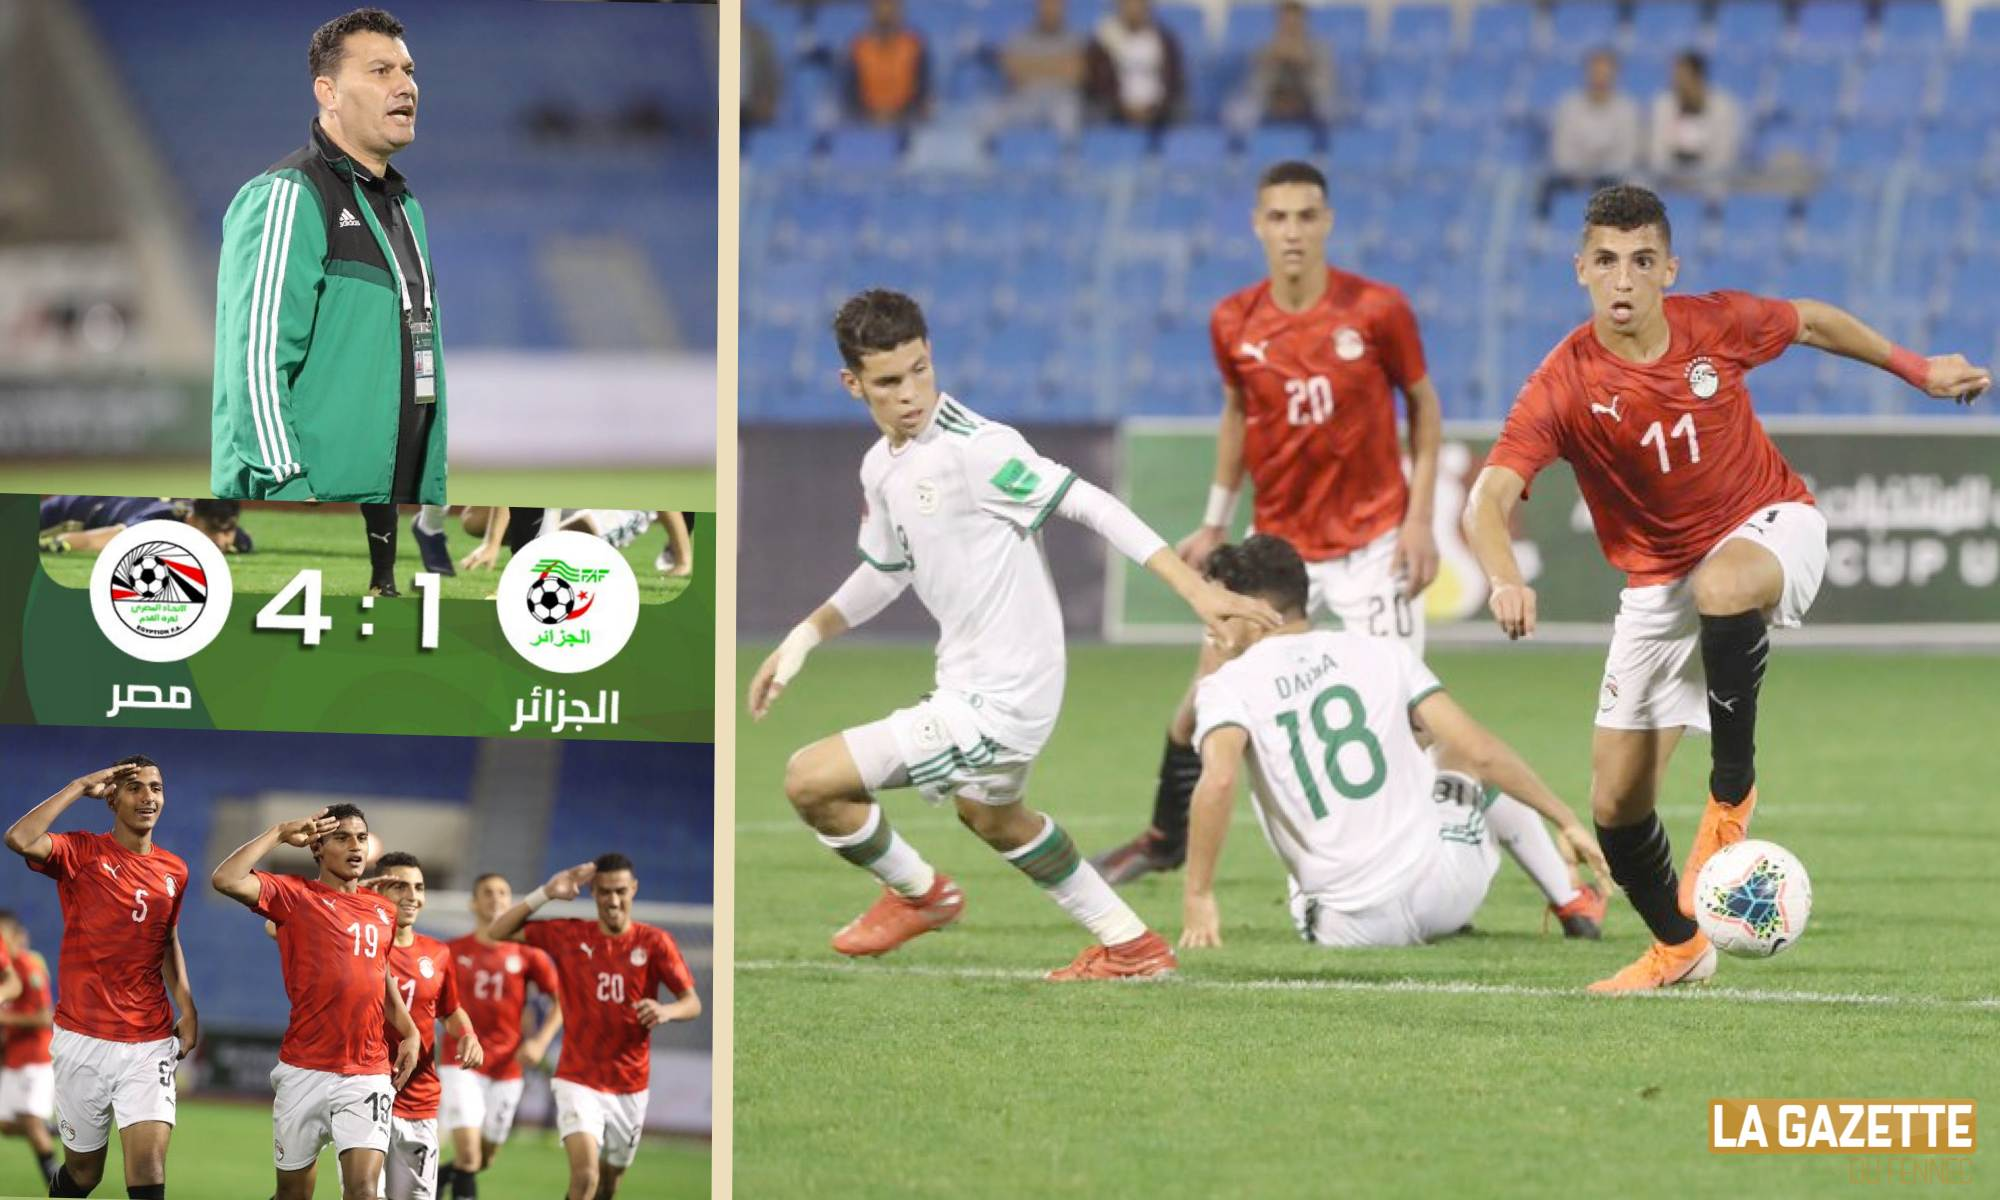 coupe arabe u20 egypte 4 1